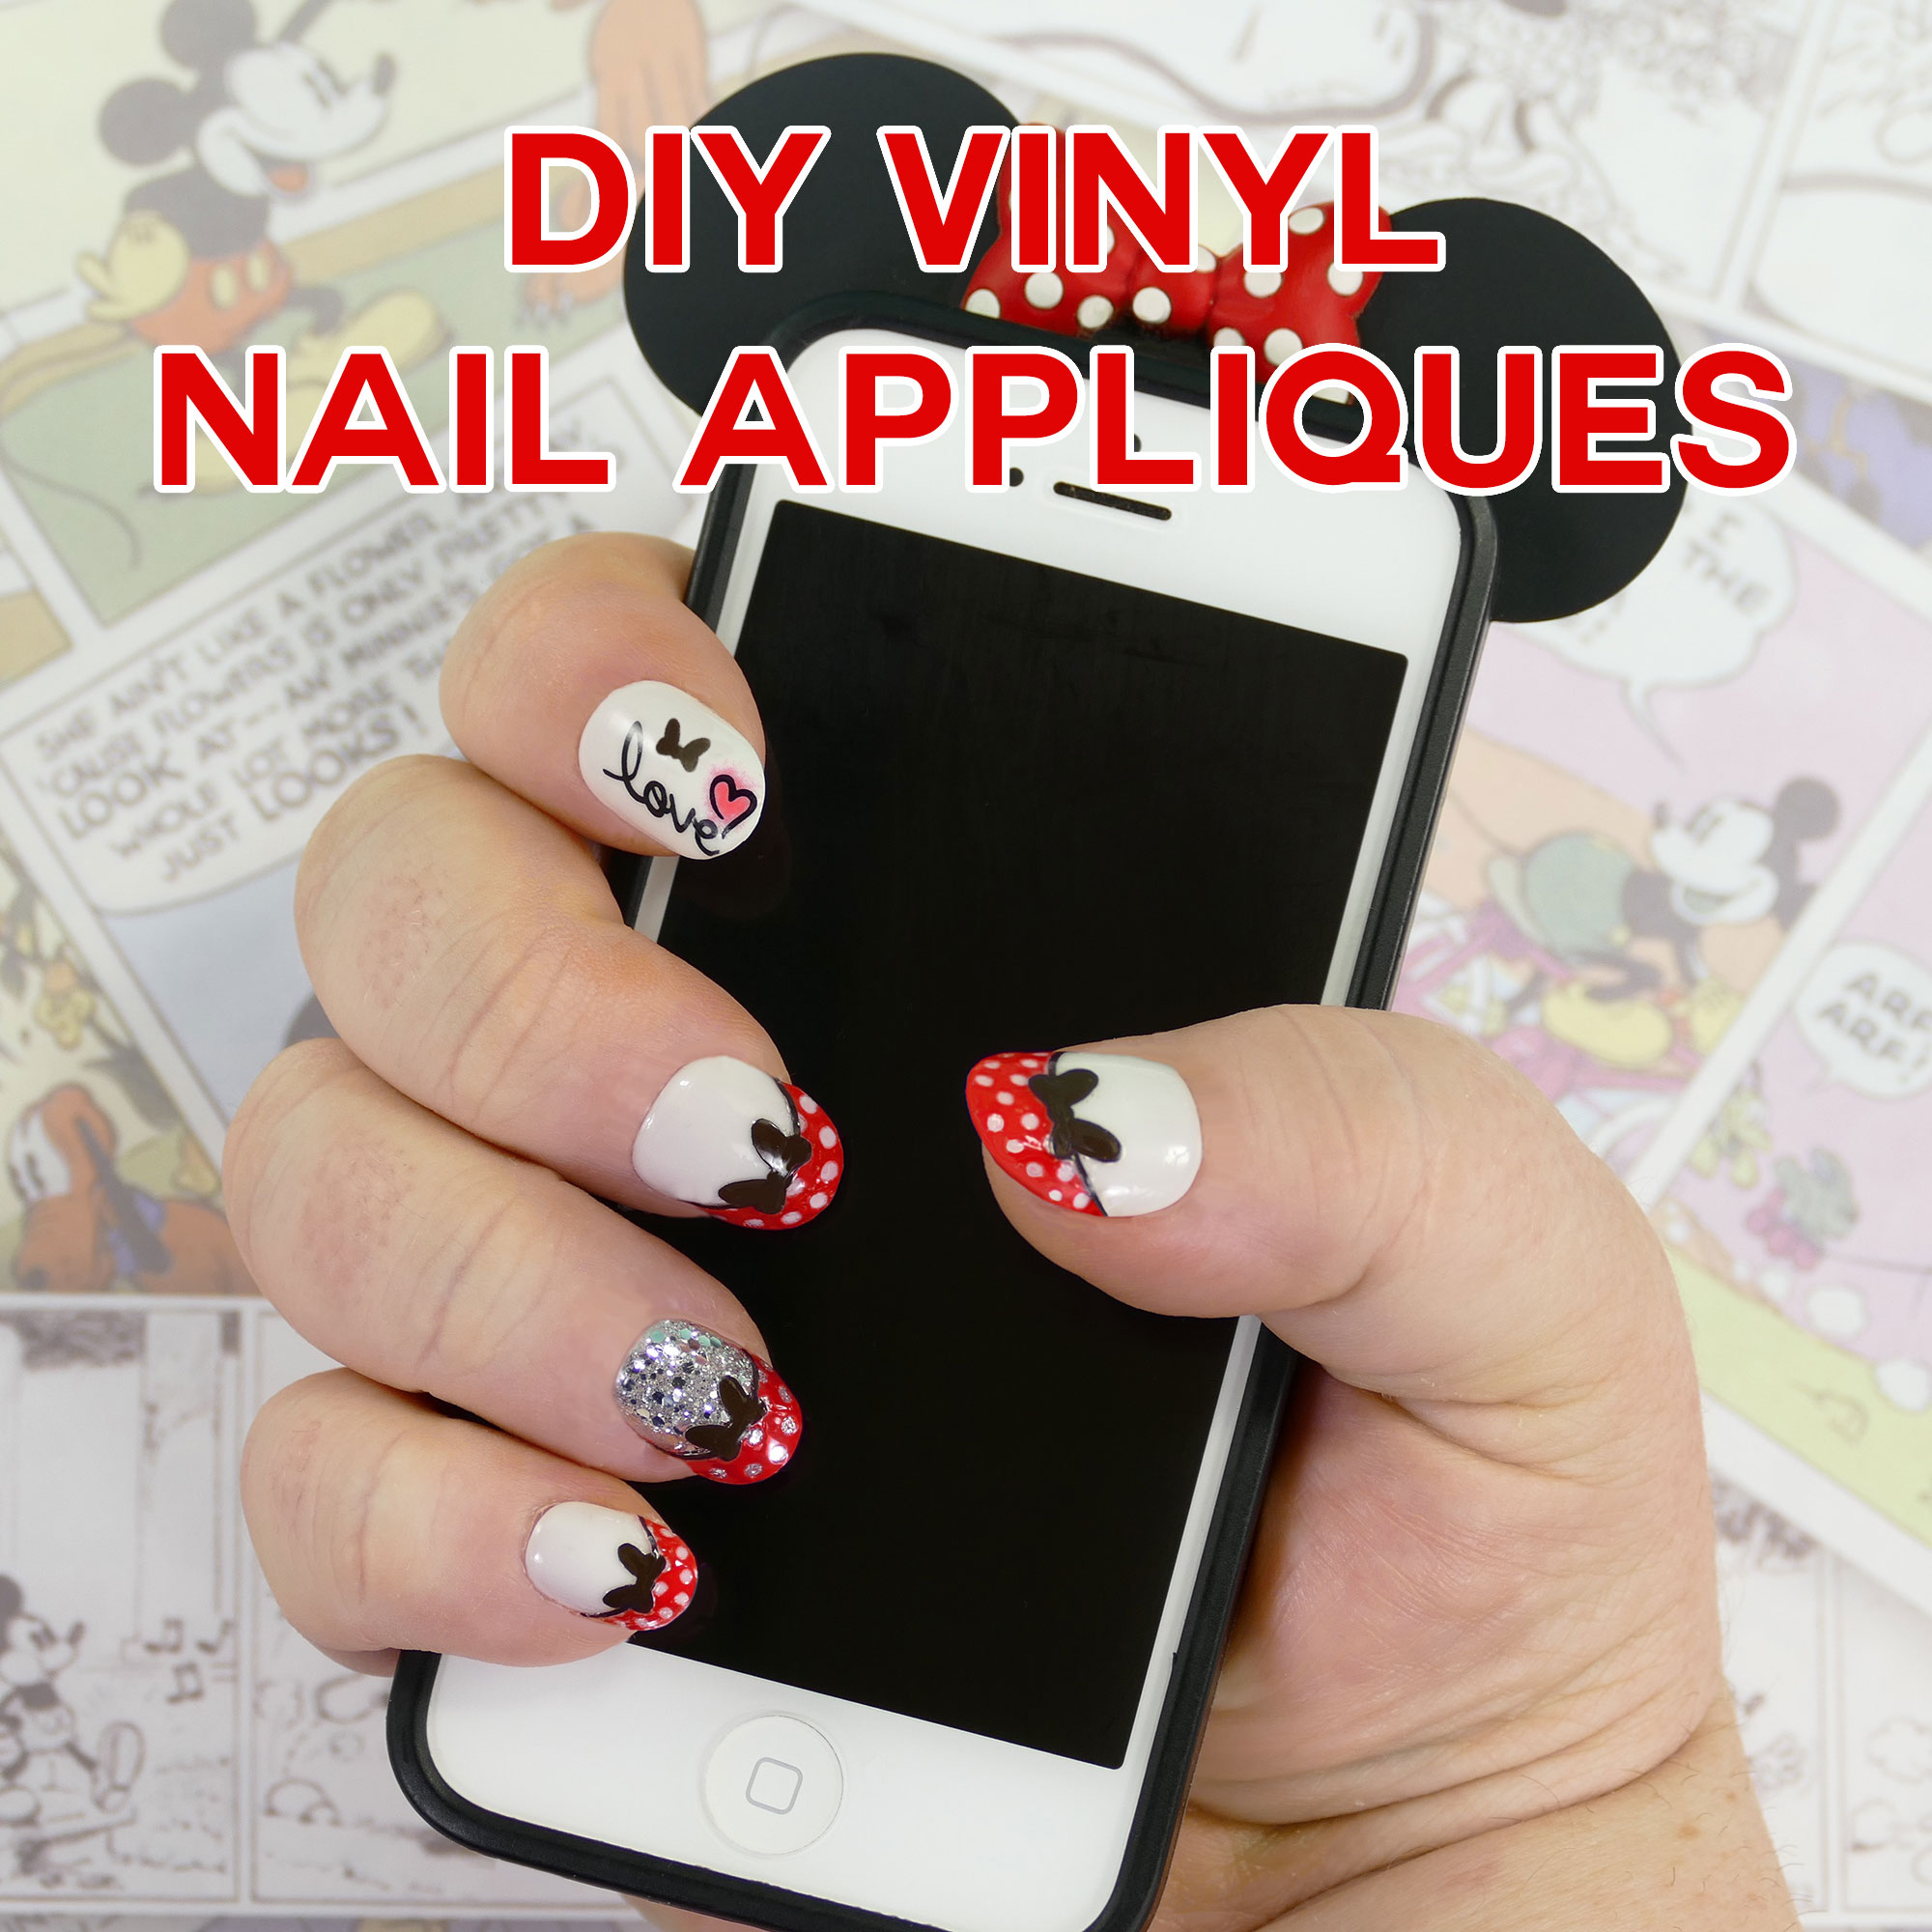 DIY Minnie Mouse Vinyl Nail Appliques | Made on the Cricut | JenniferMaker.com